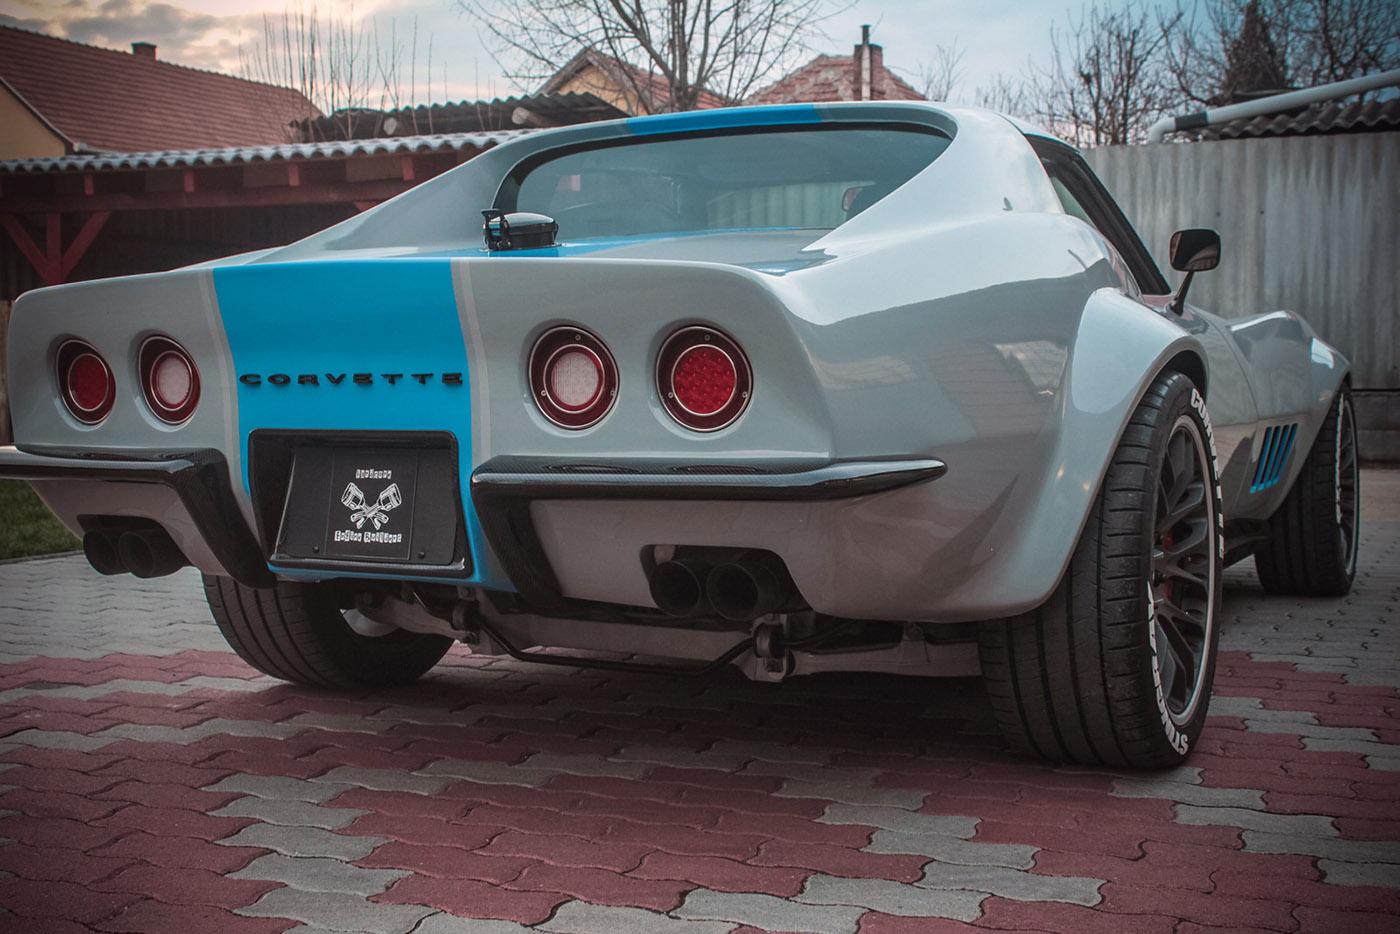 c3 corvette with a c6 powertrain engine swap depot. Black Bedroom Furniture Sets. Home Design Ideas